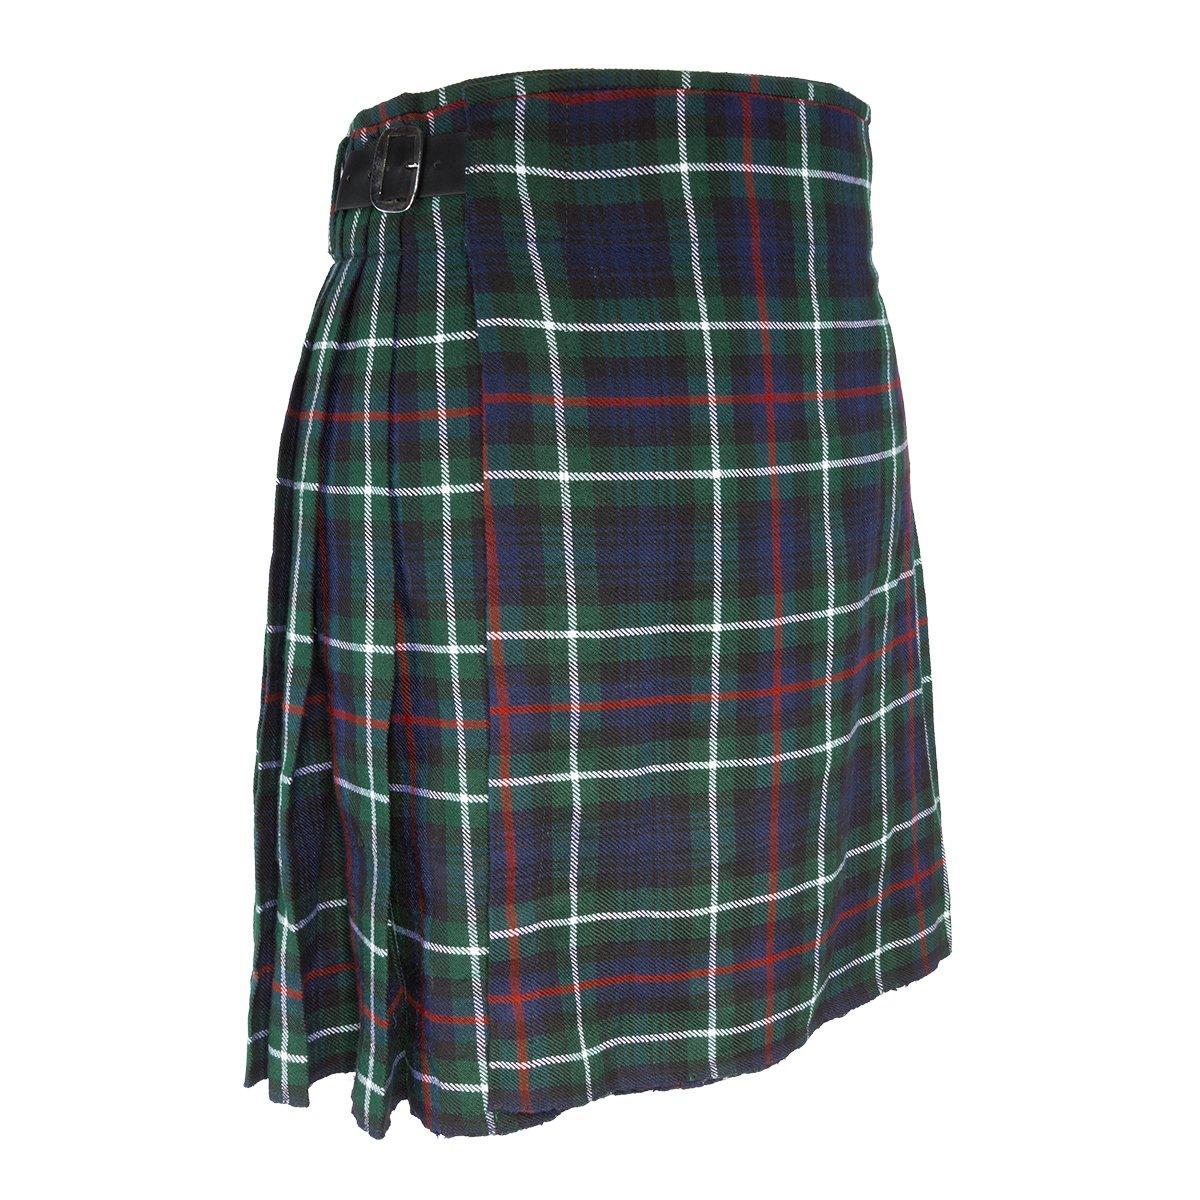 "Best Kilts Men's Traditional Scottish 5 Yard Mackenzie Tartan Kilt 30""-32"" Green"